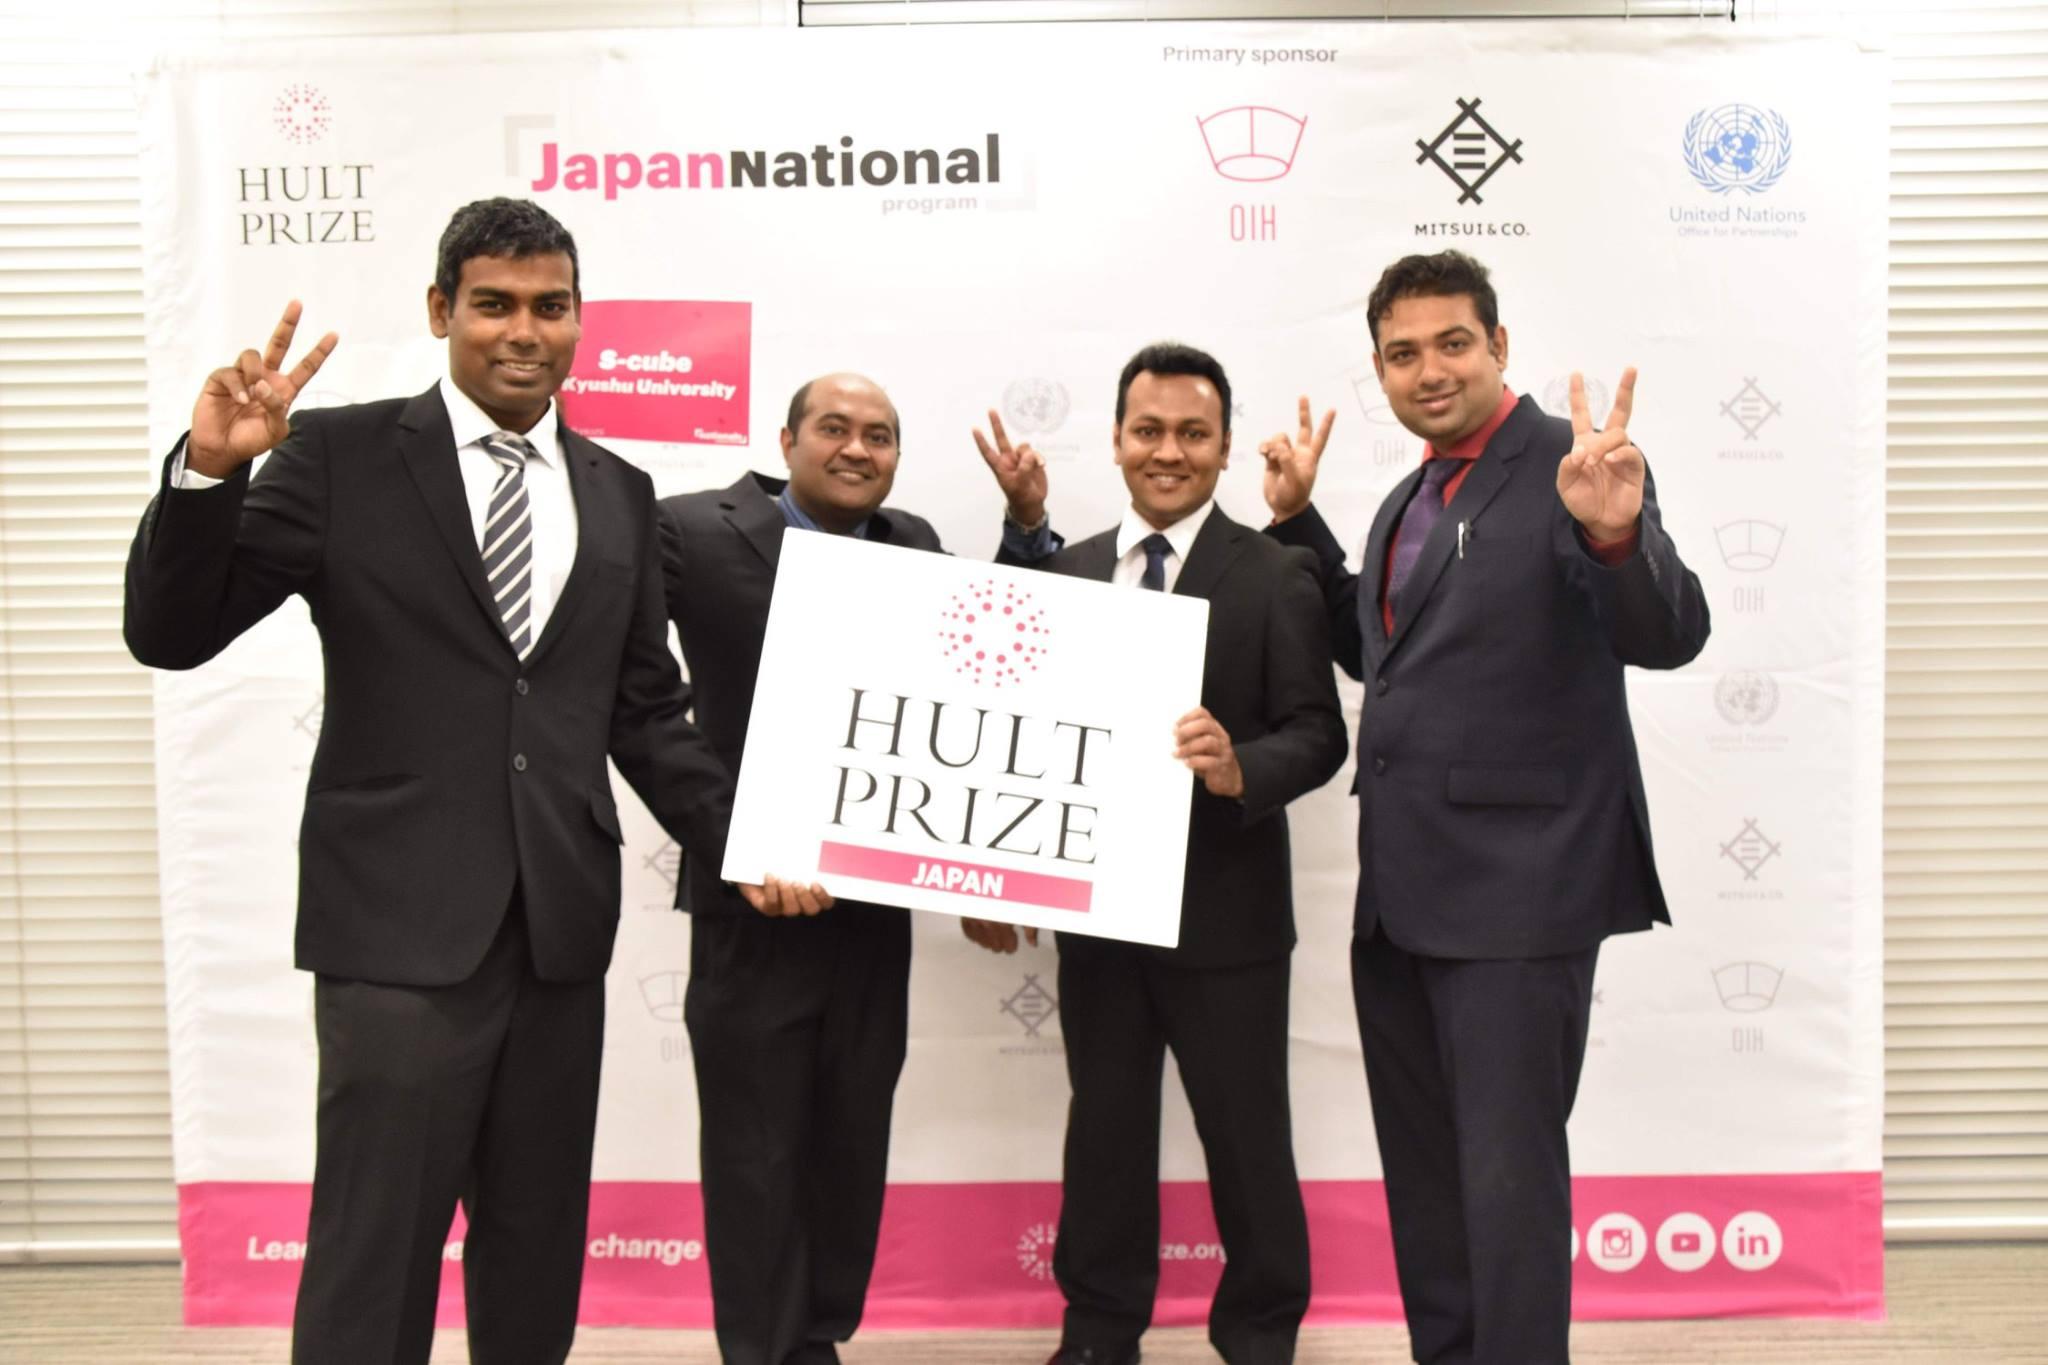 Hult Prize Japan Final 2018